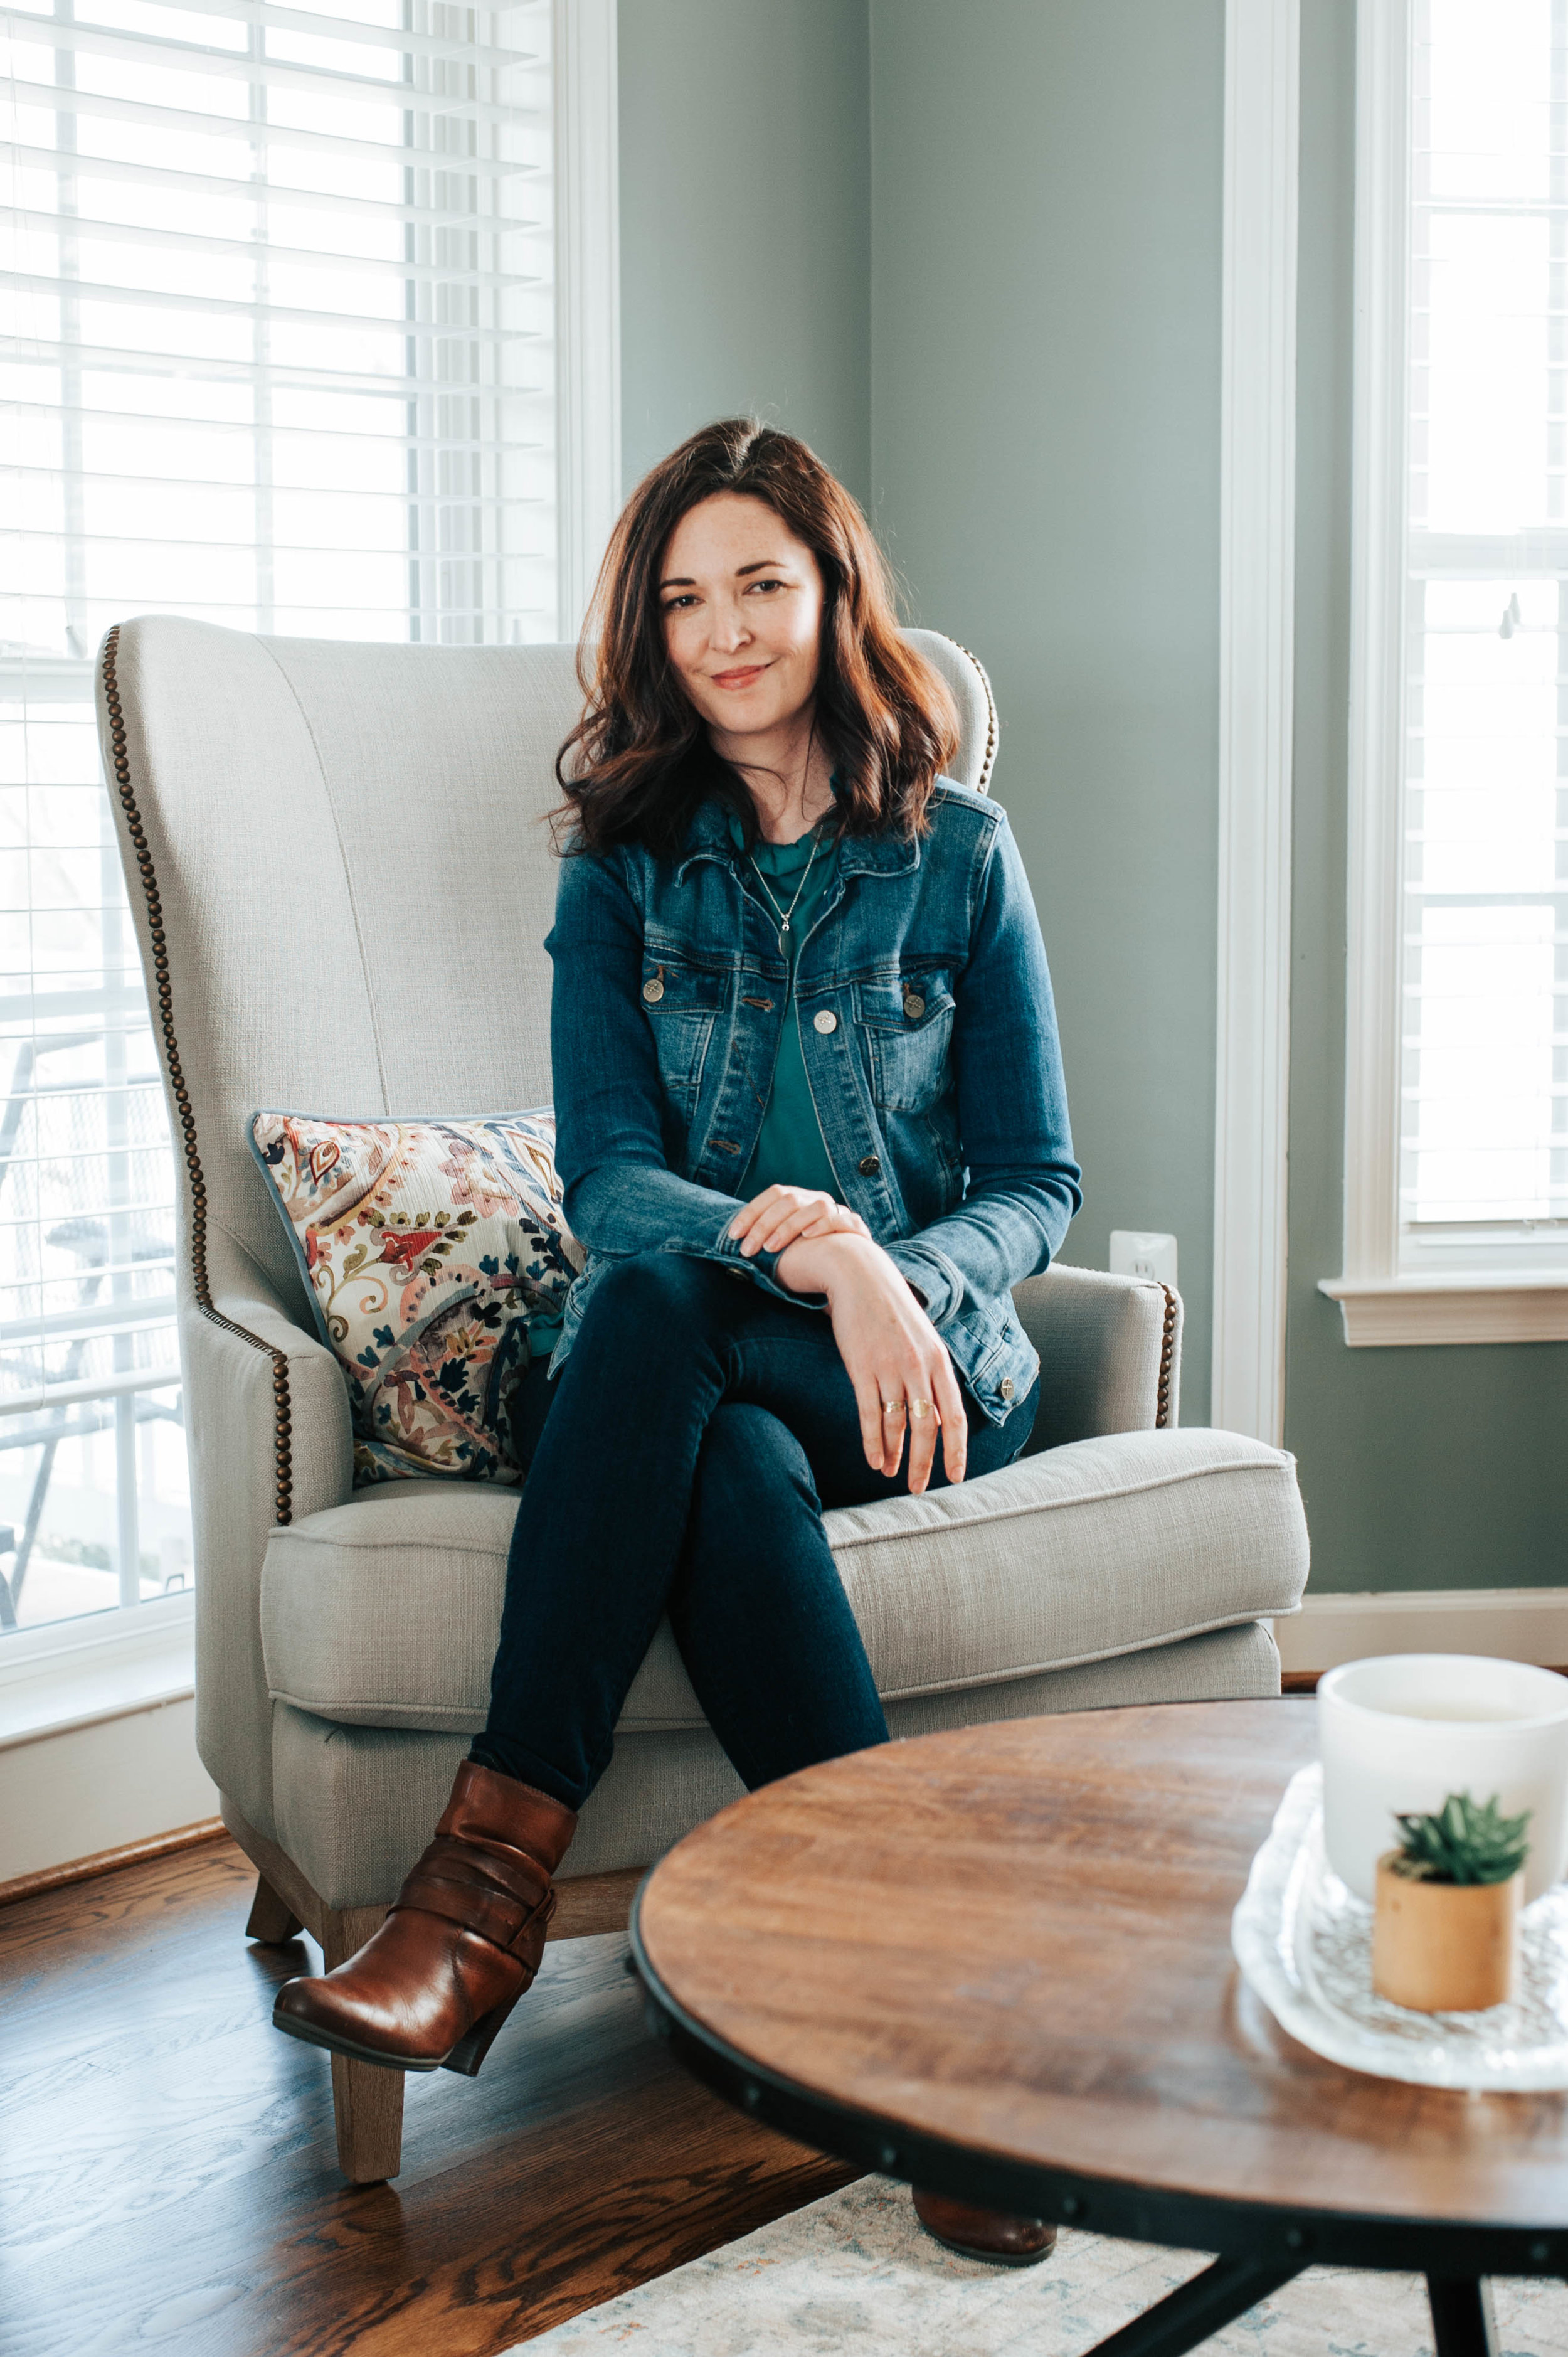 Erin Pelicano, Founder, Erin Pelicano Fine Jewelry - Pinterest profile: Erin Pelicano Fine Jewelry